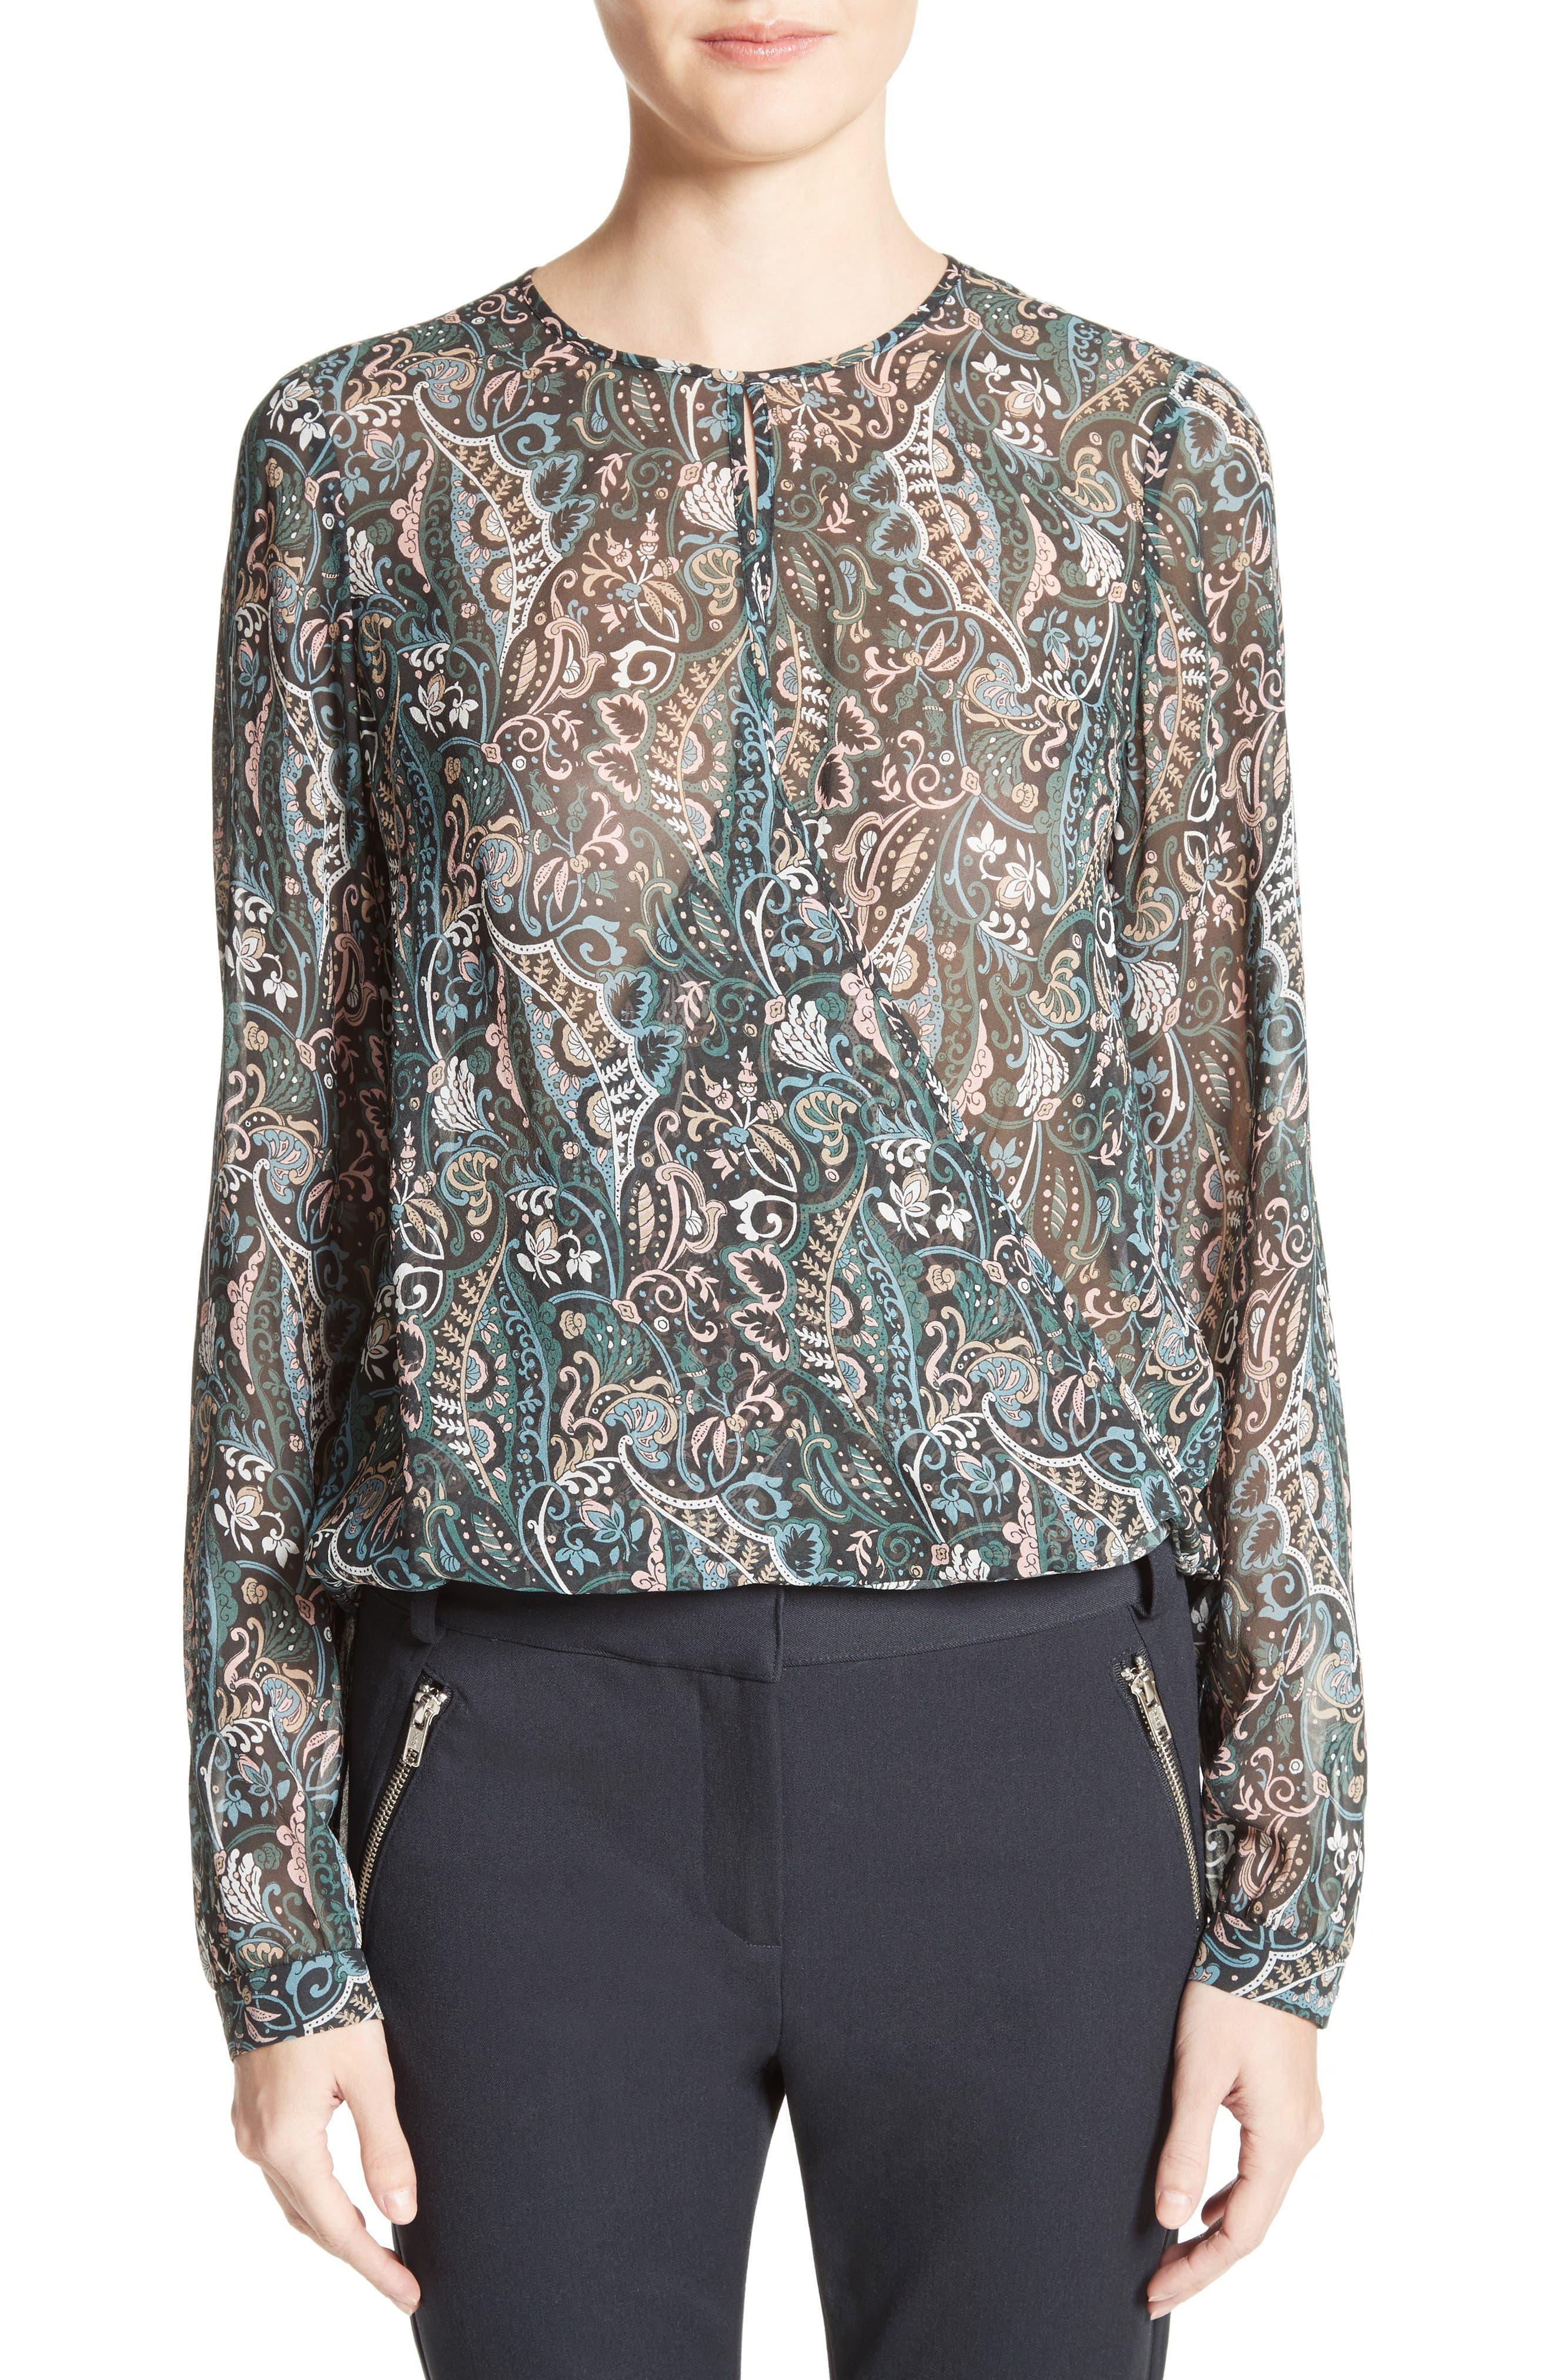 Gayle Paisley Print Silk Blouse,                         Main,                         color, Nude/ Blue/ Green Multi